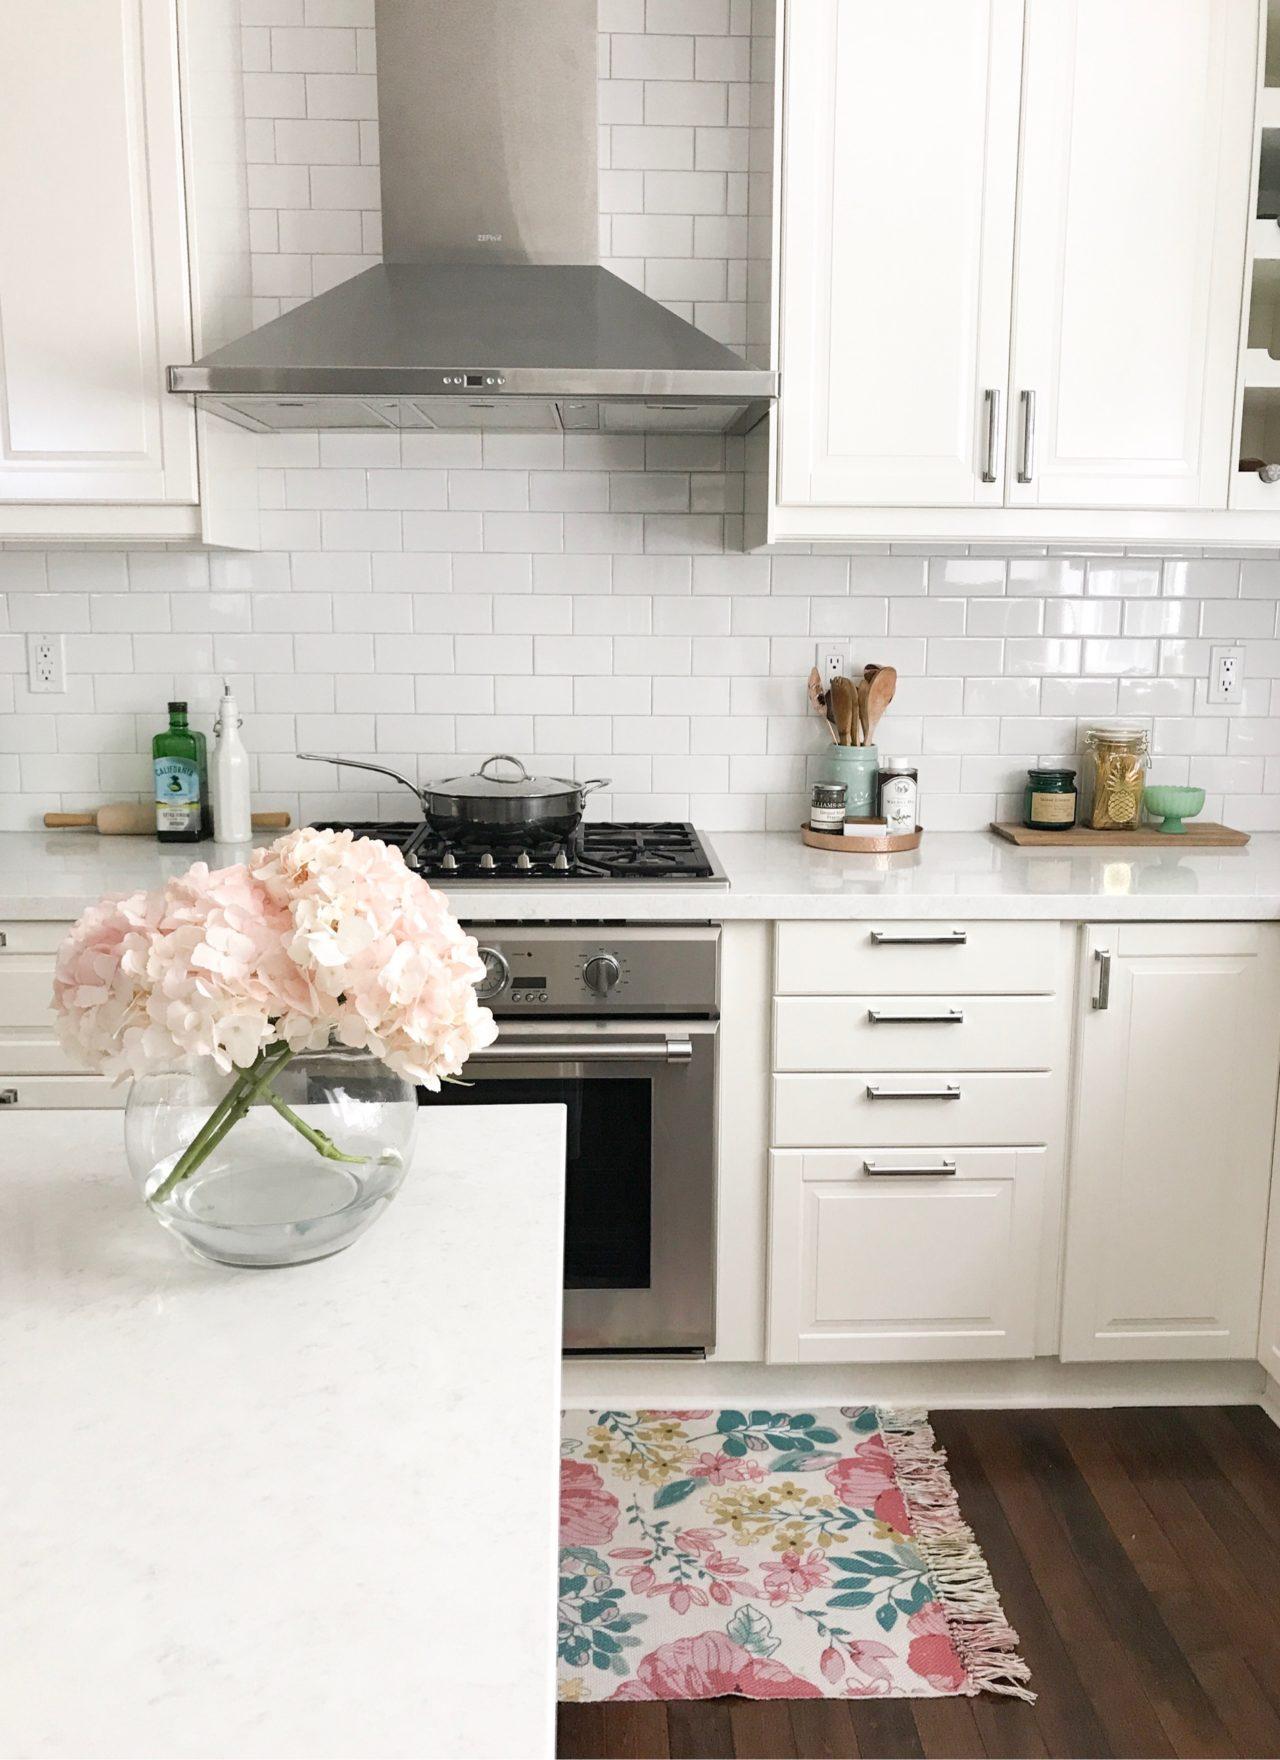 13 Real-Life Beautiful and Inspirational IKEA Kitchens - 1111 Light Lane